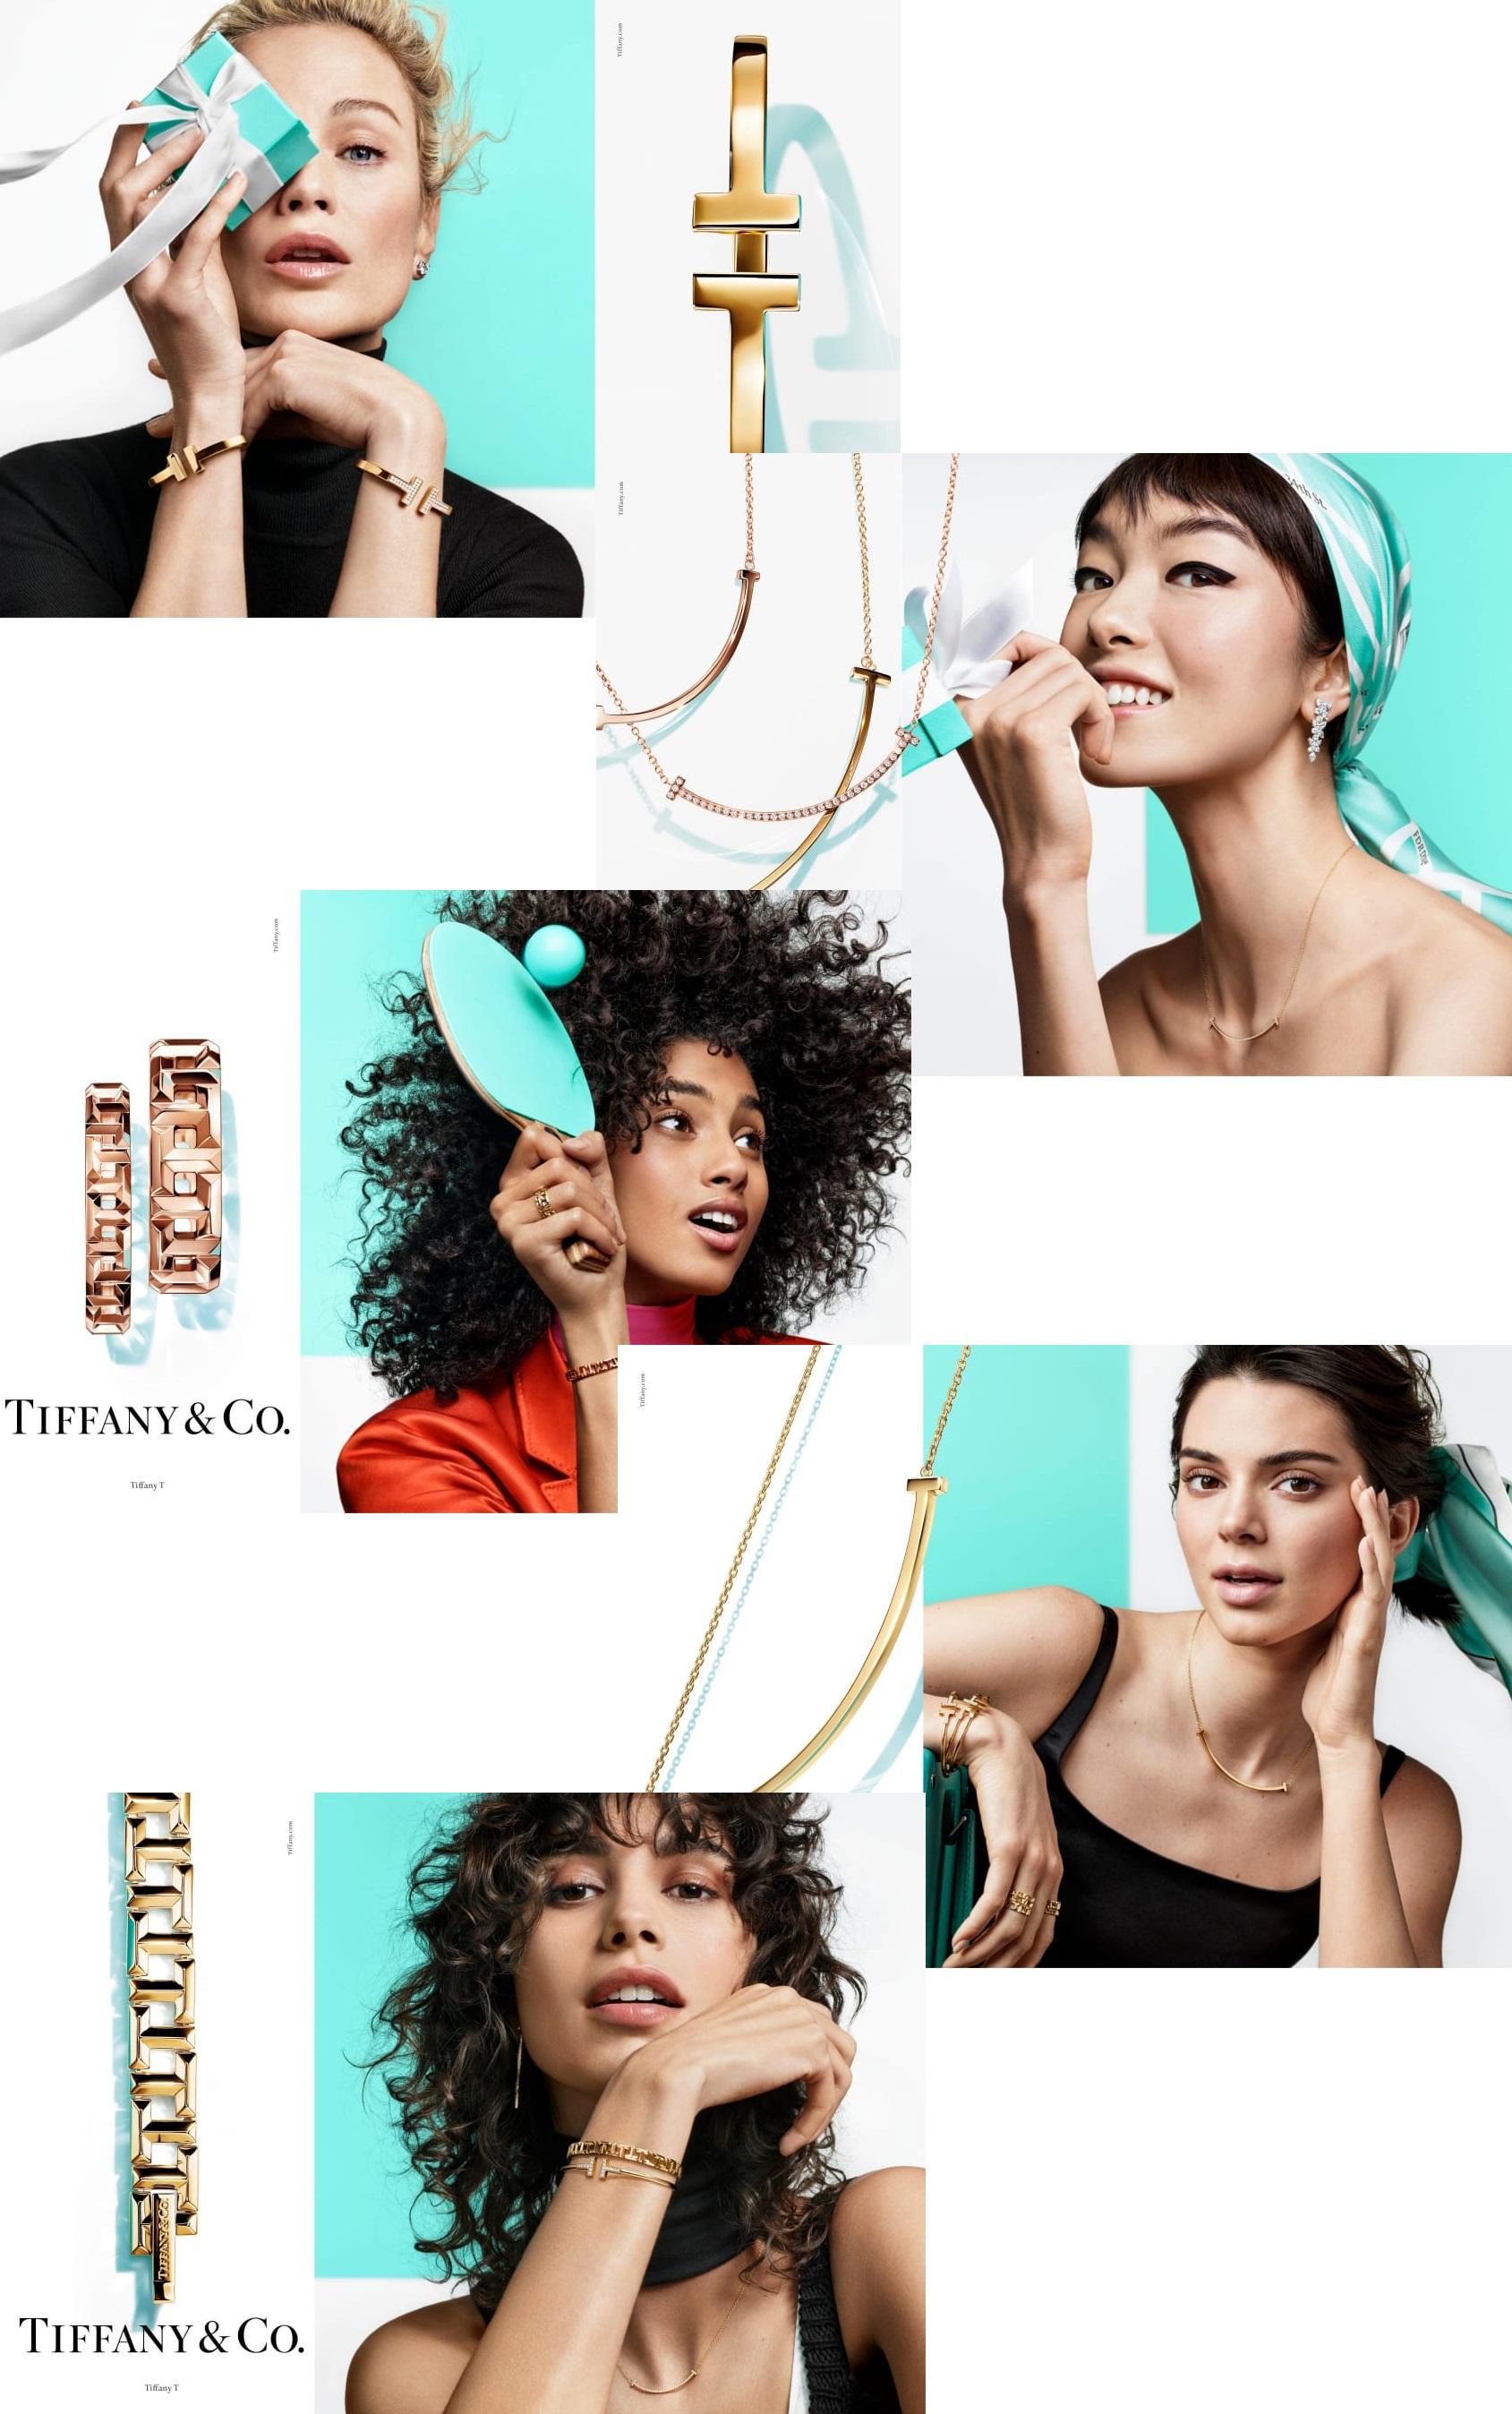 Craig-McDean-Tiffany-T Campaign-Sp2019 (2).jpg